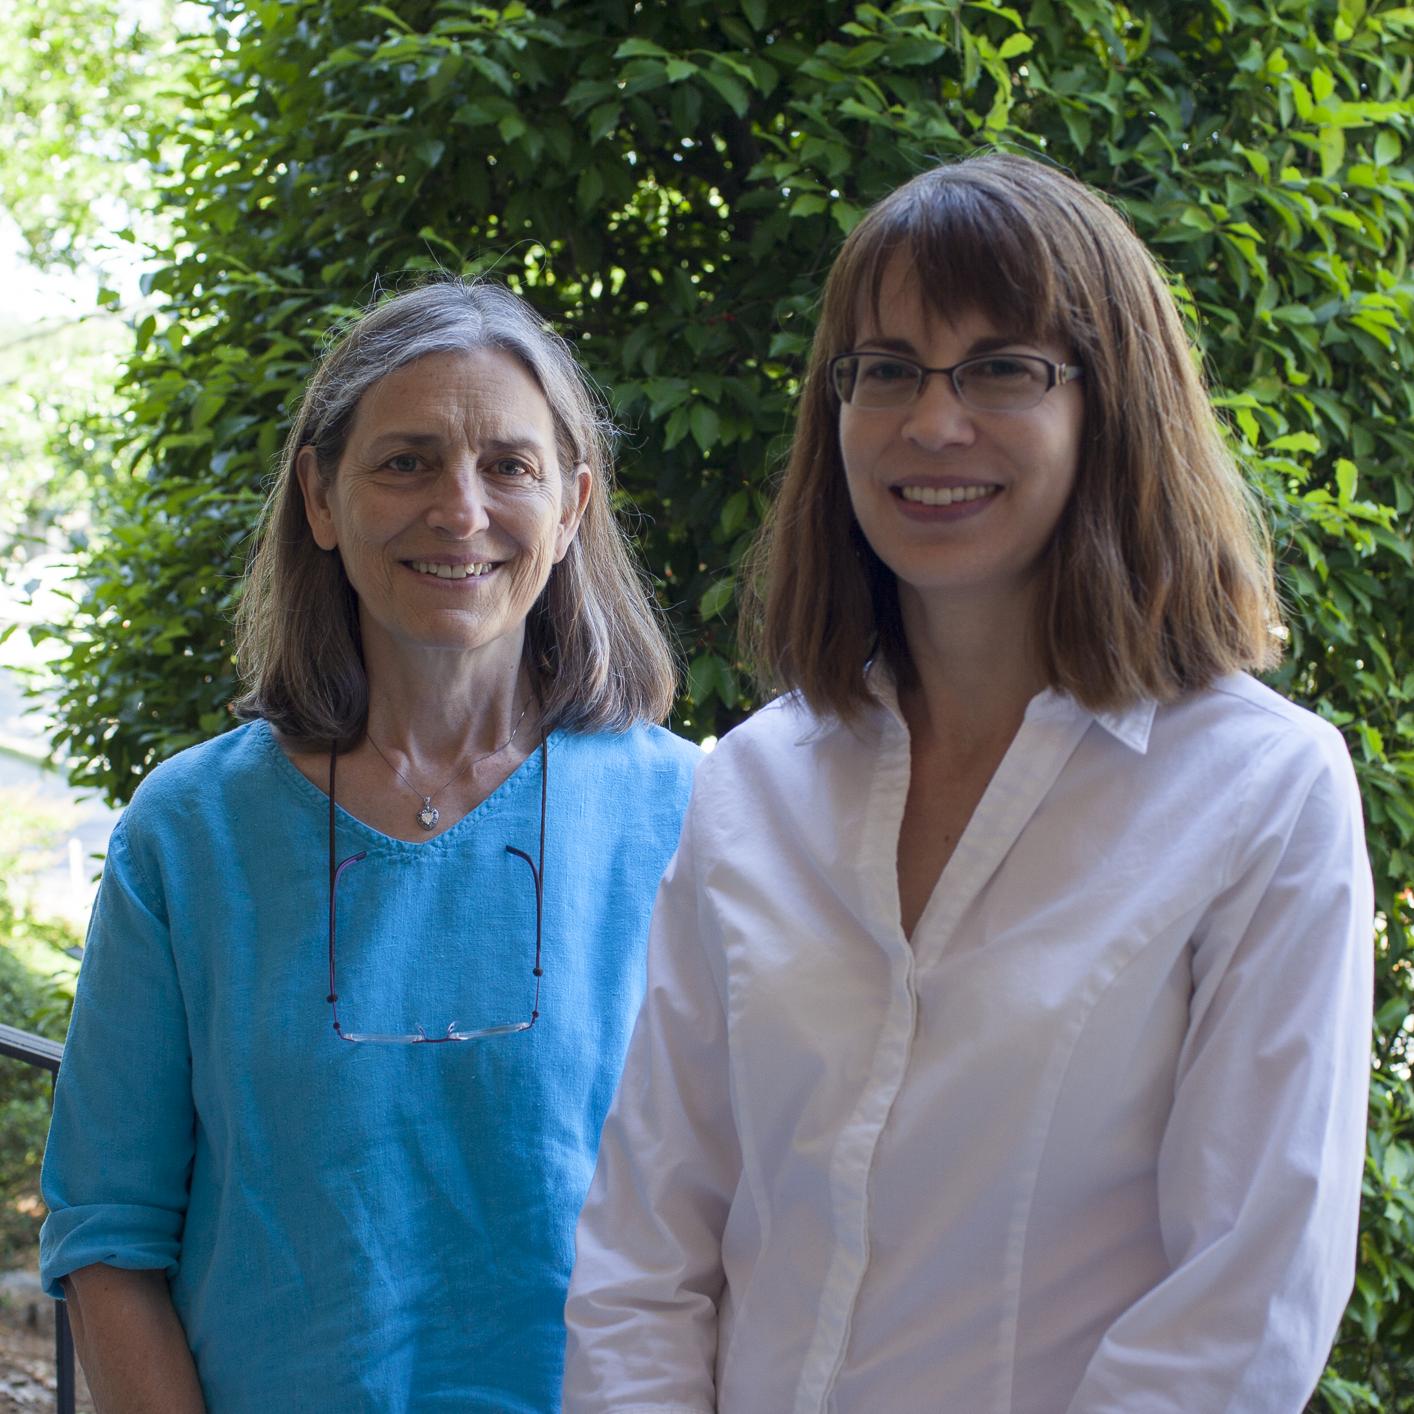 Photograph: Sue Goode (left), Sonya Detwiler (right)